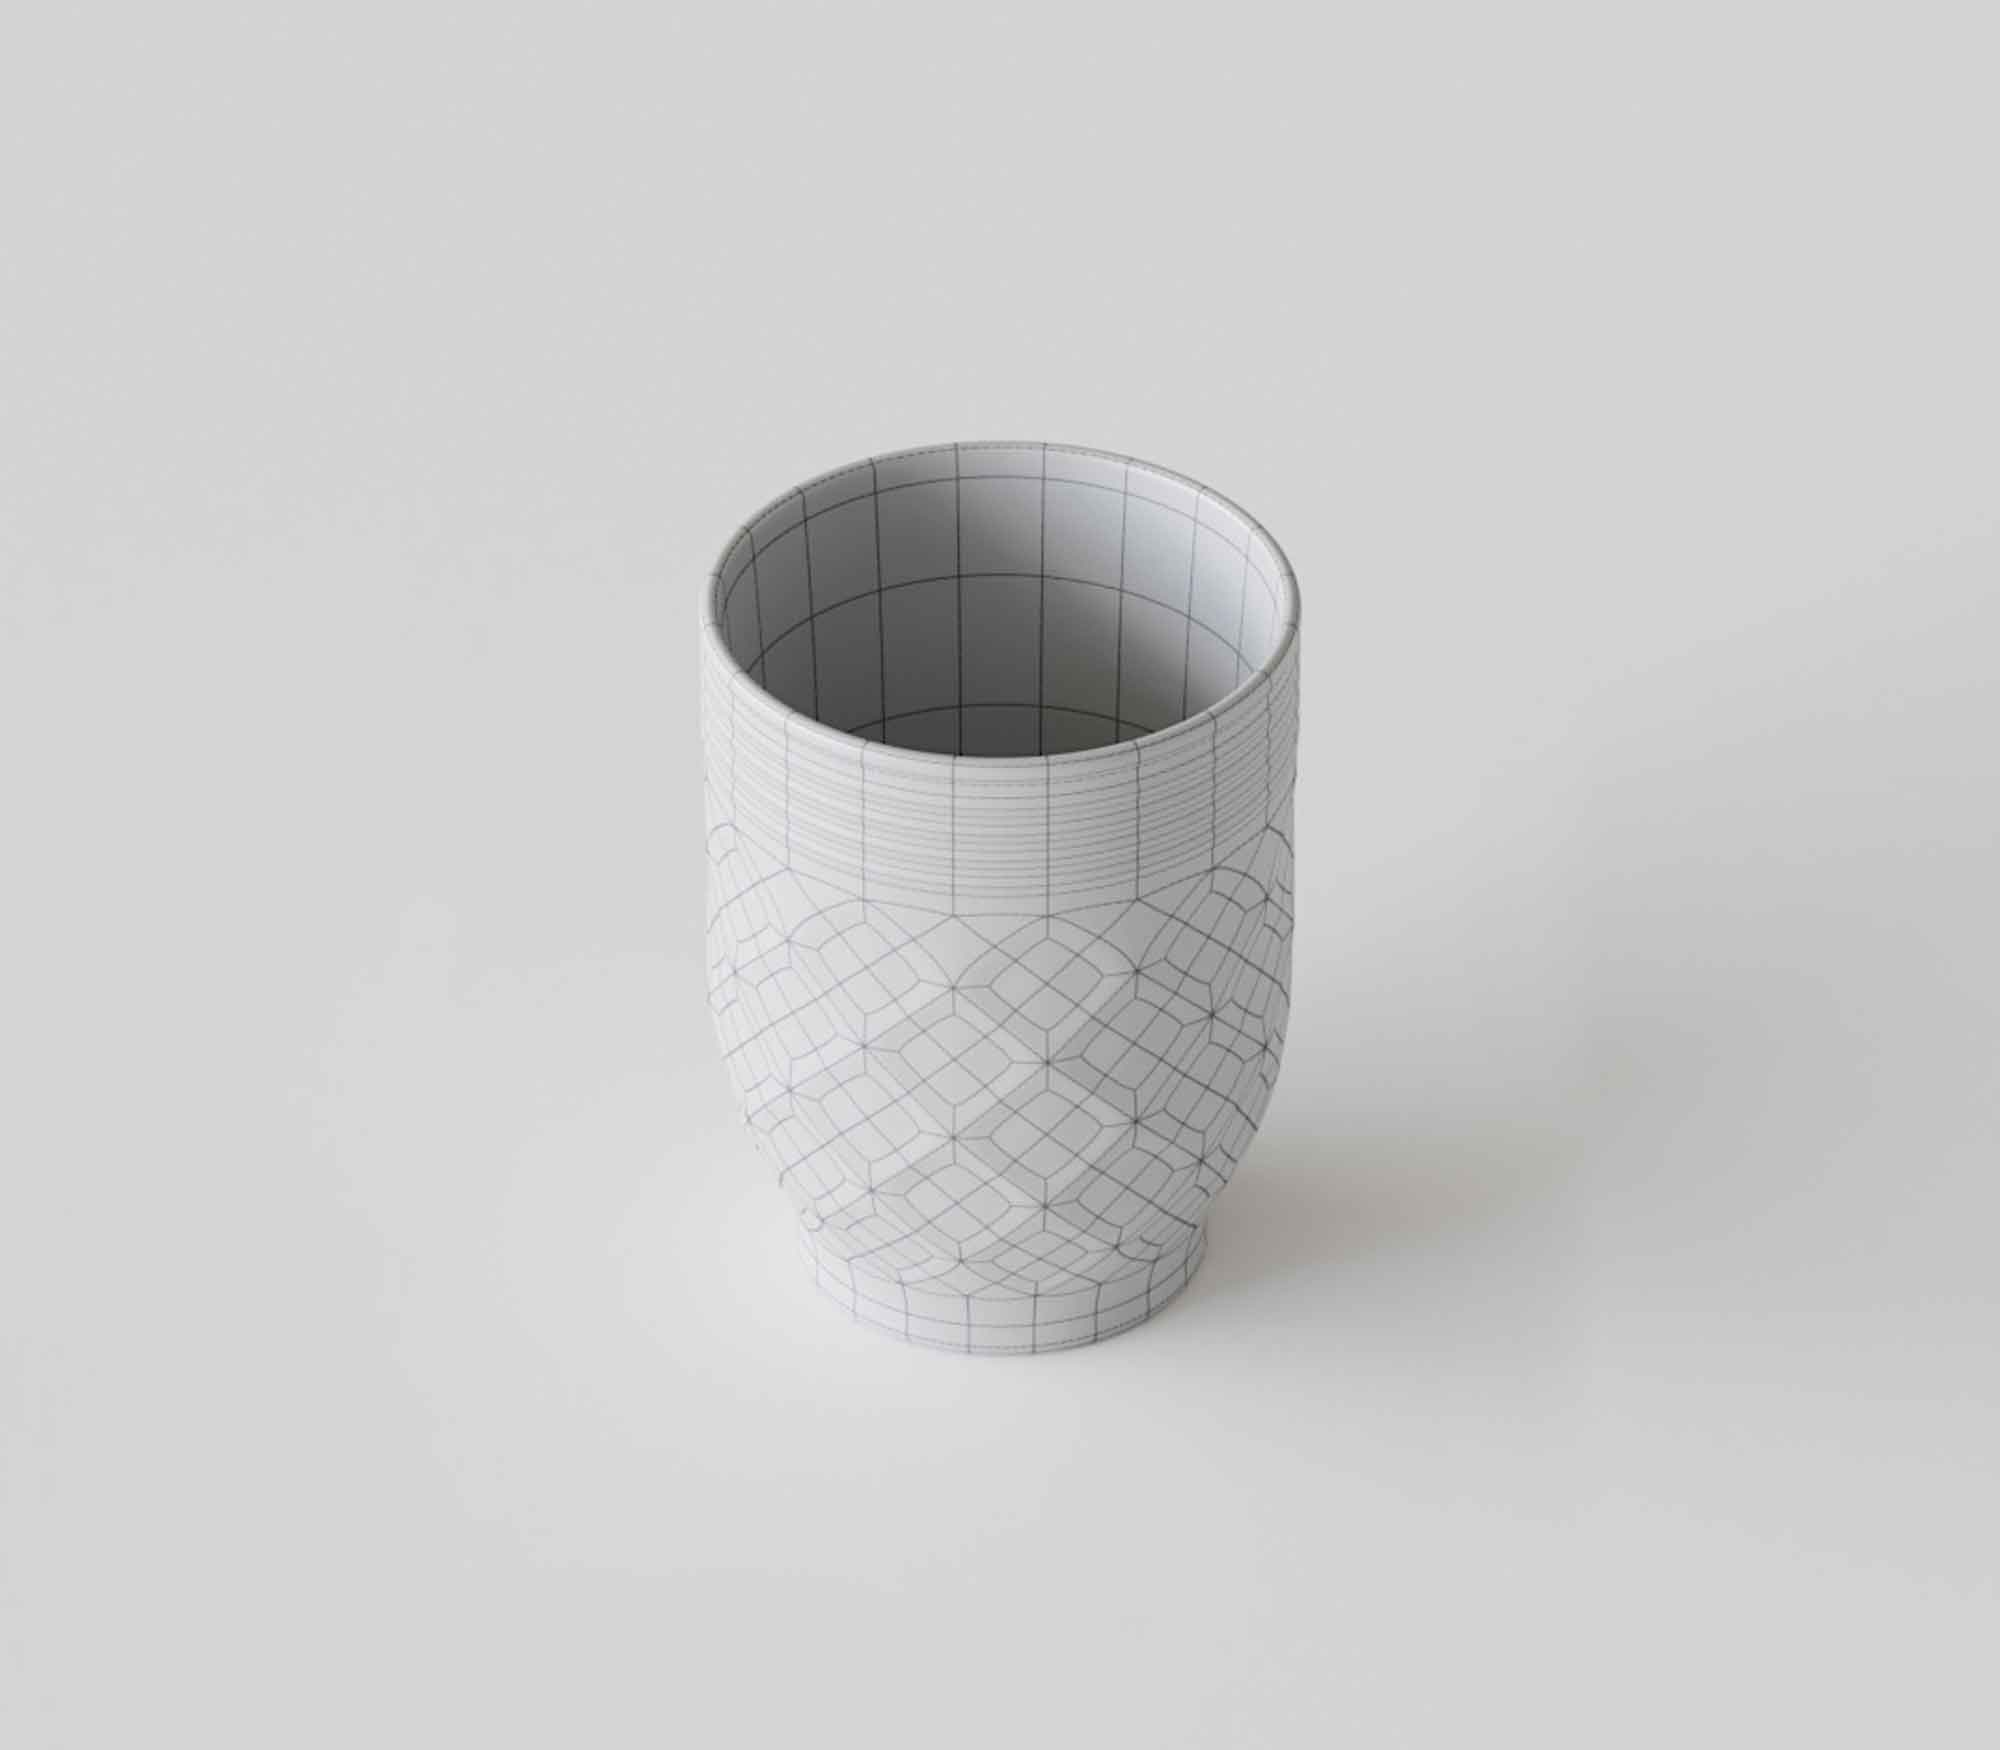 Kitchenware 3D Model 6